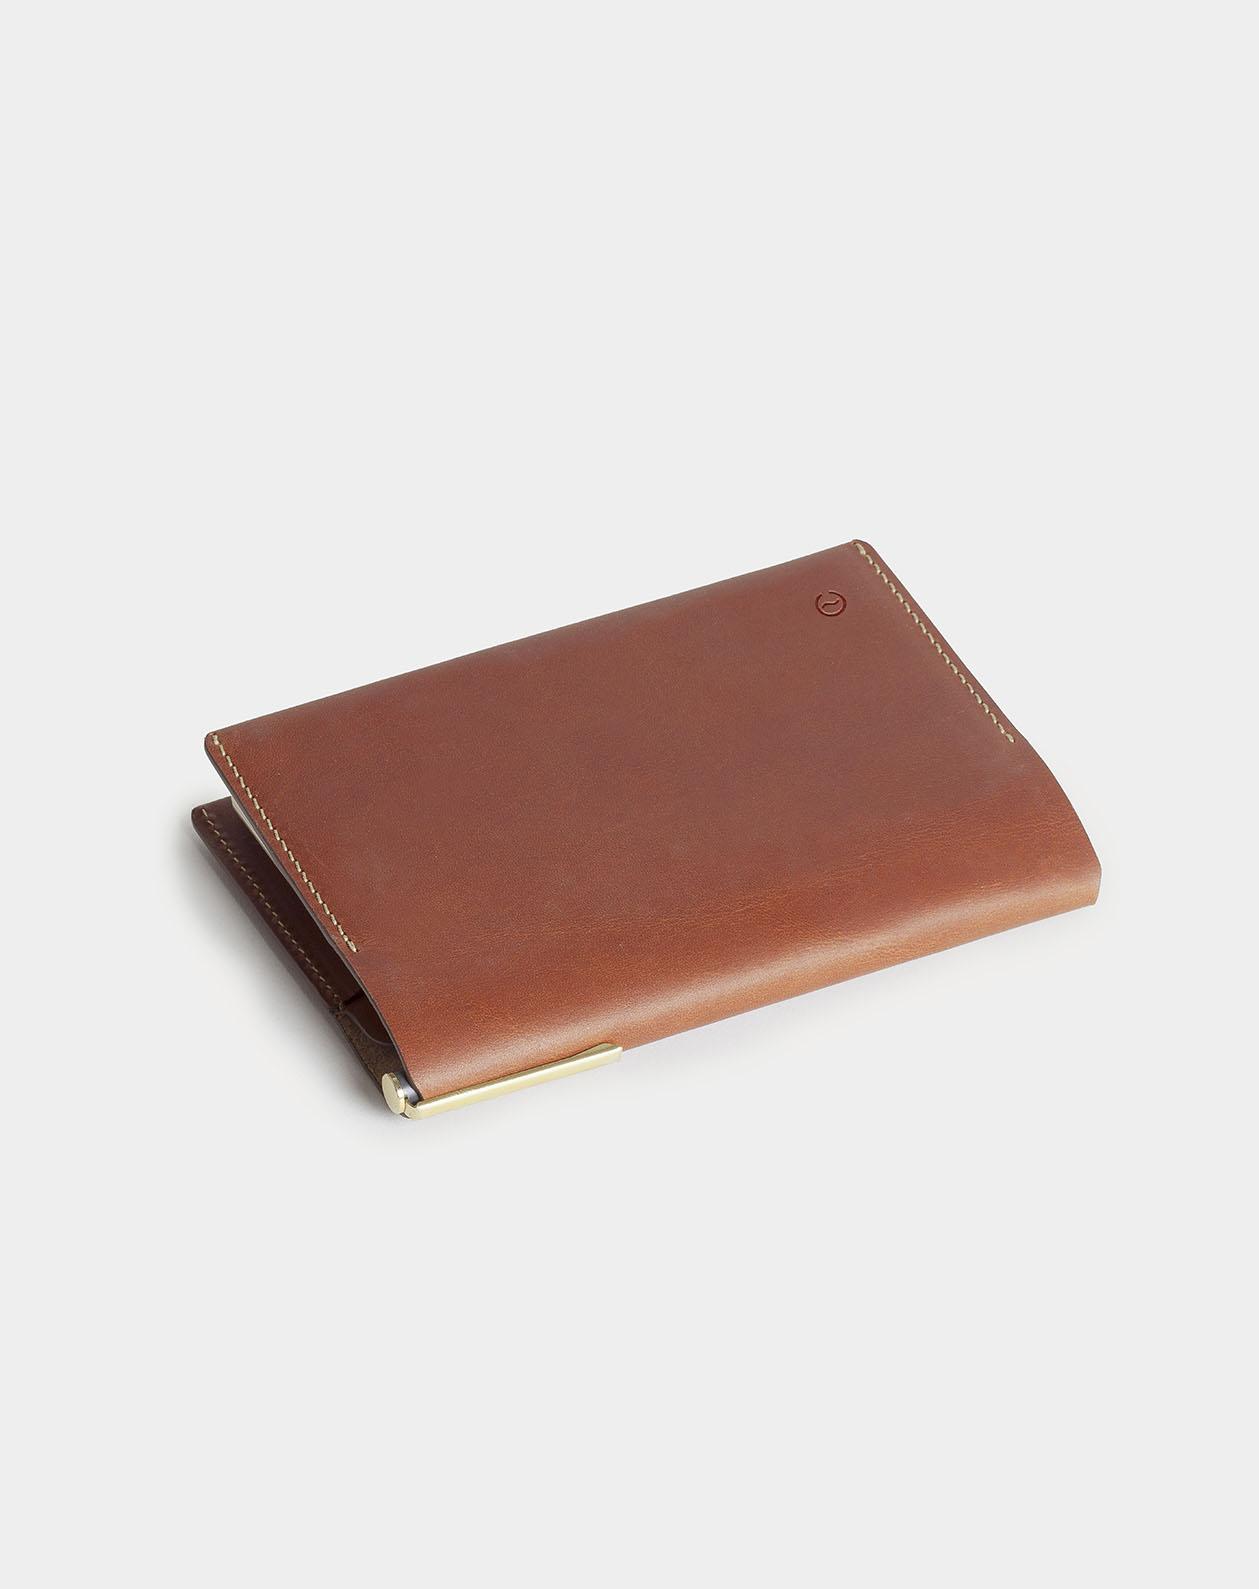 passport wallet side